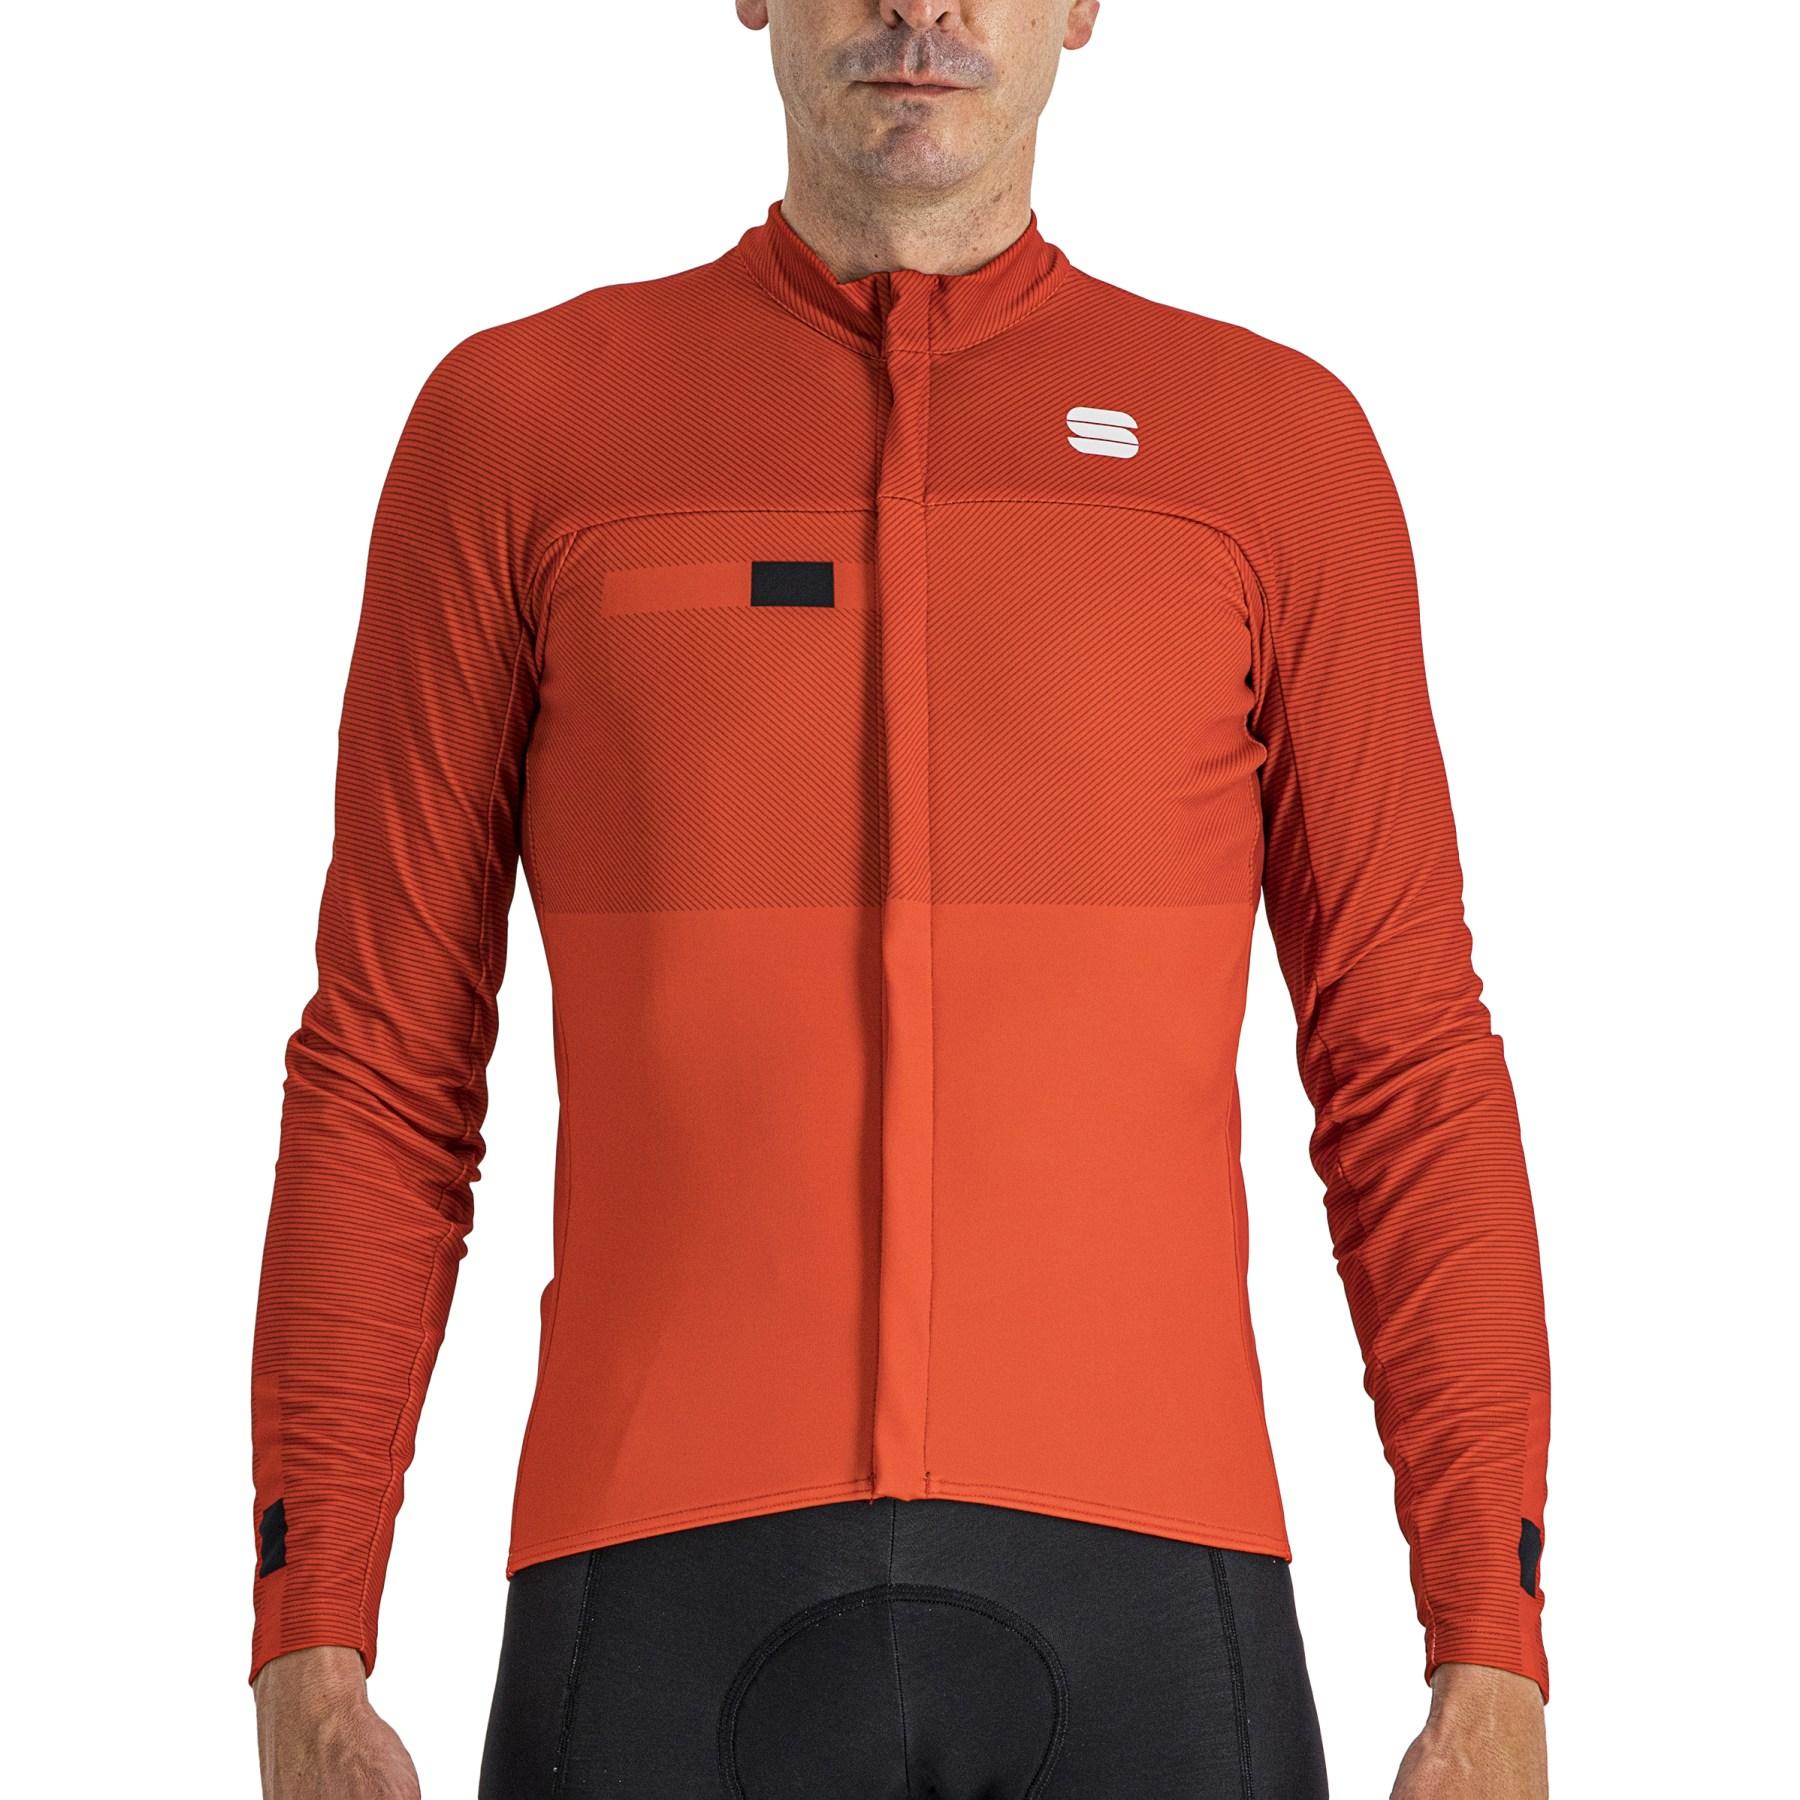 Sportful Bodyfit Pro Thermal Jersey - 567 Red/Black